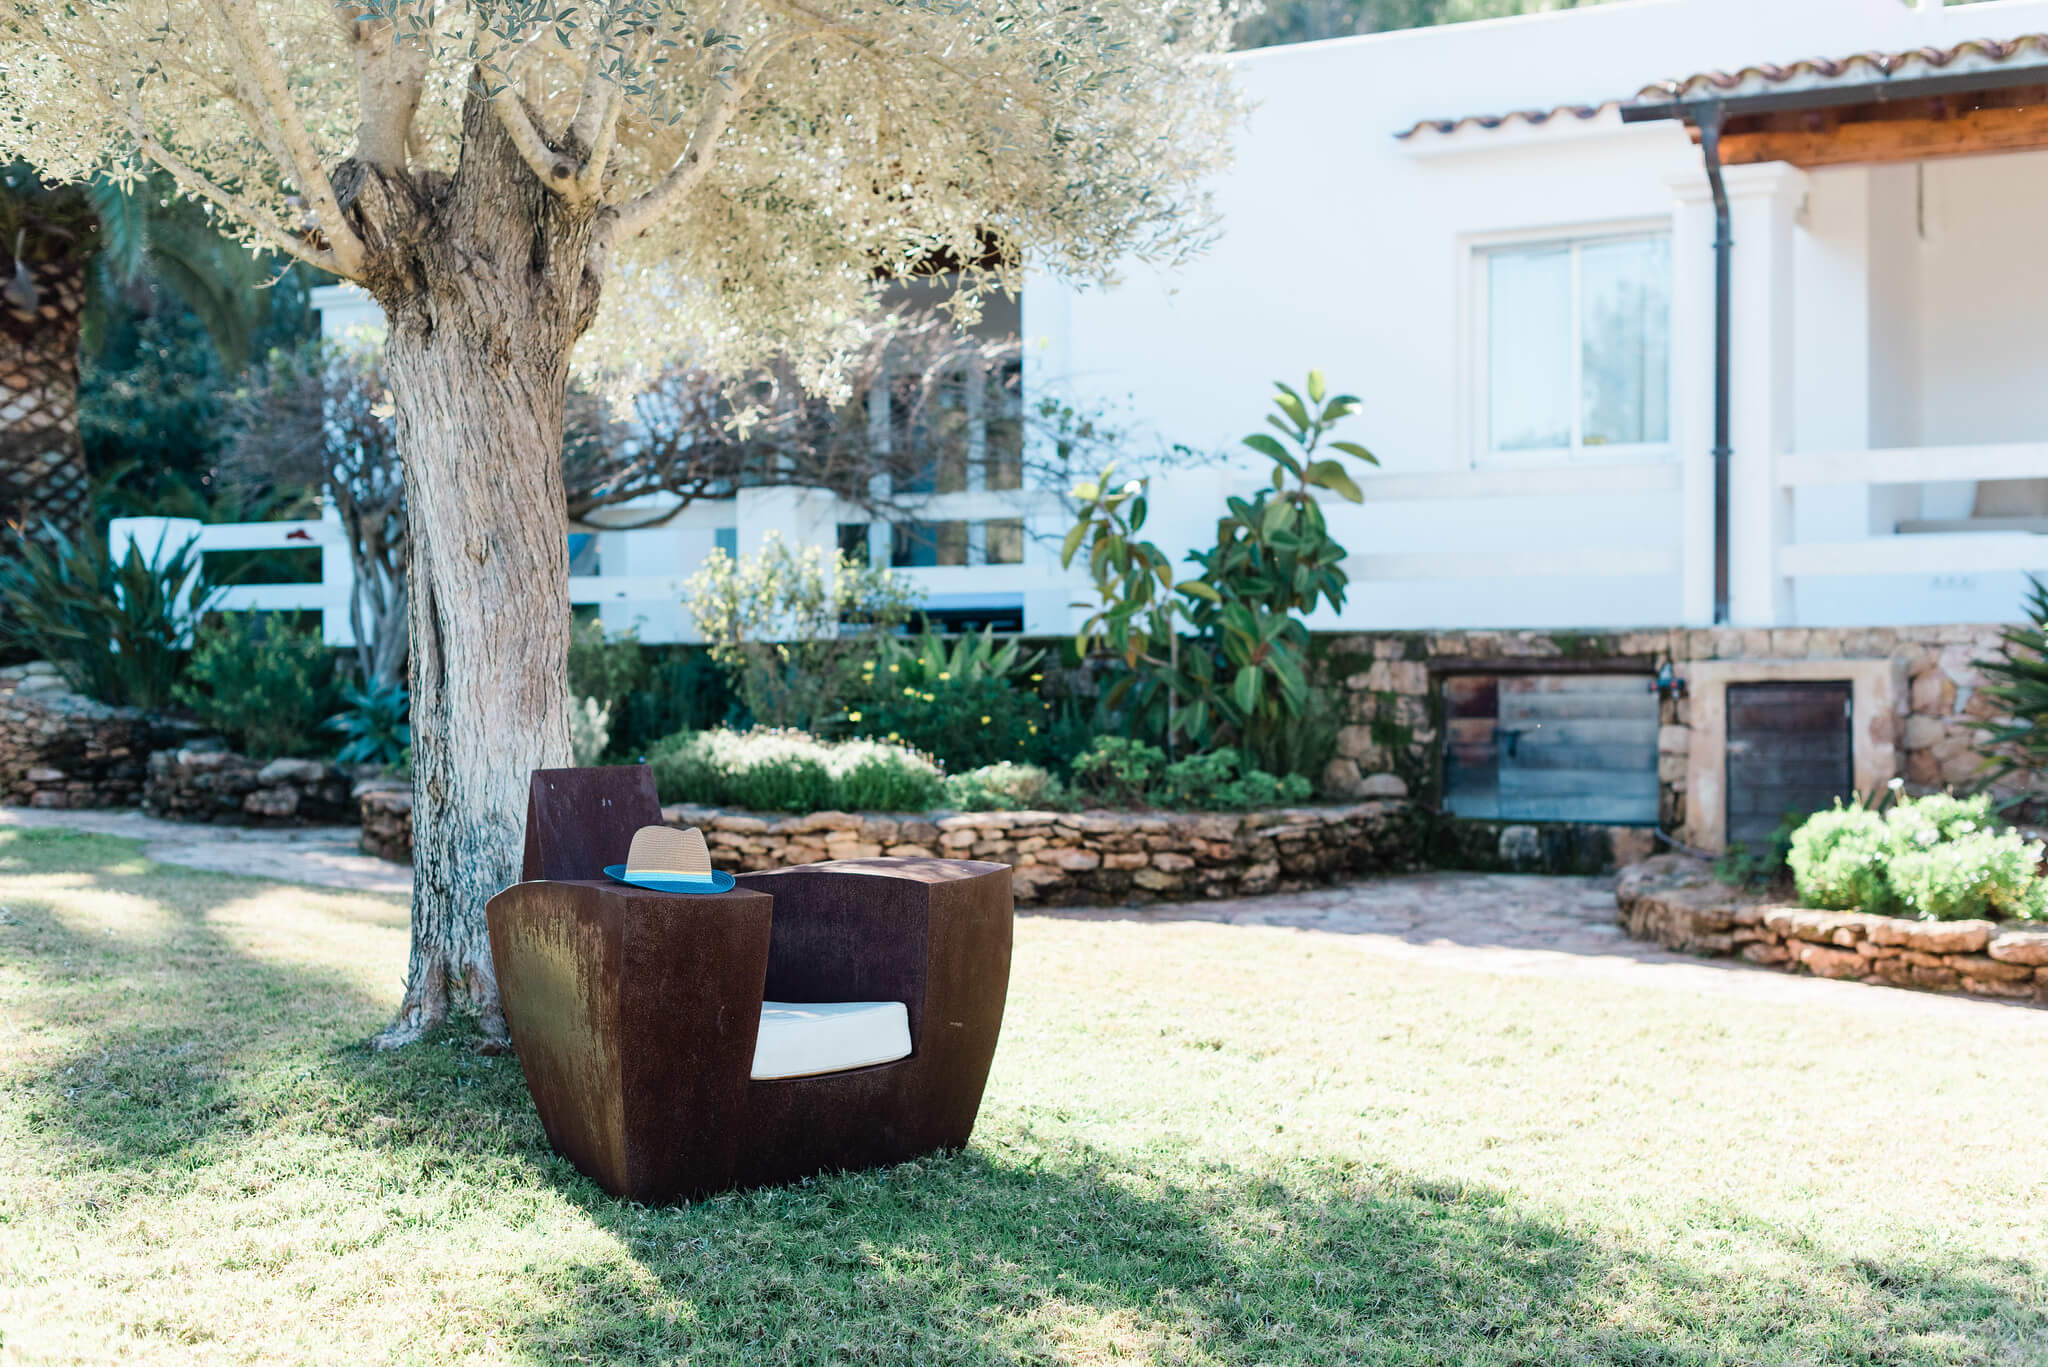 https://www.white-ibiza.com/wp-content/uploads/2020/05/white-ibiza-villas-can-verde-exterior-garden-chair.jpg